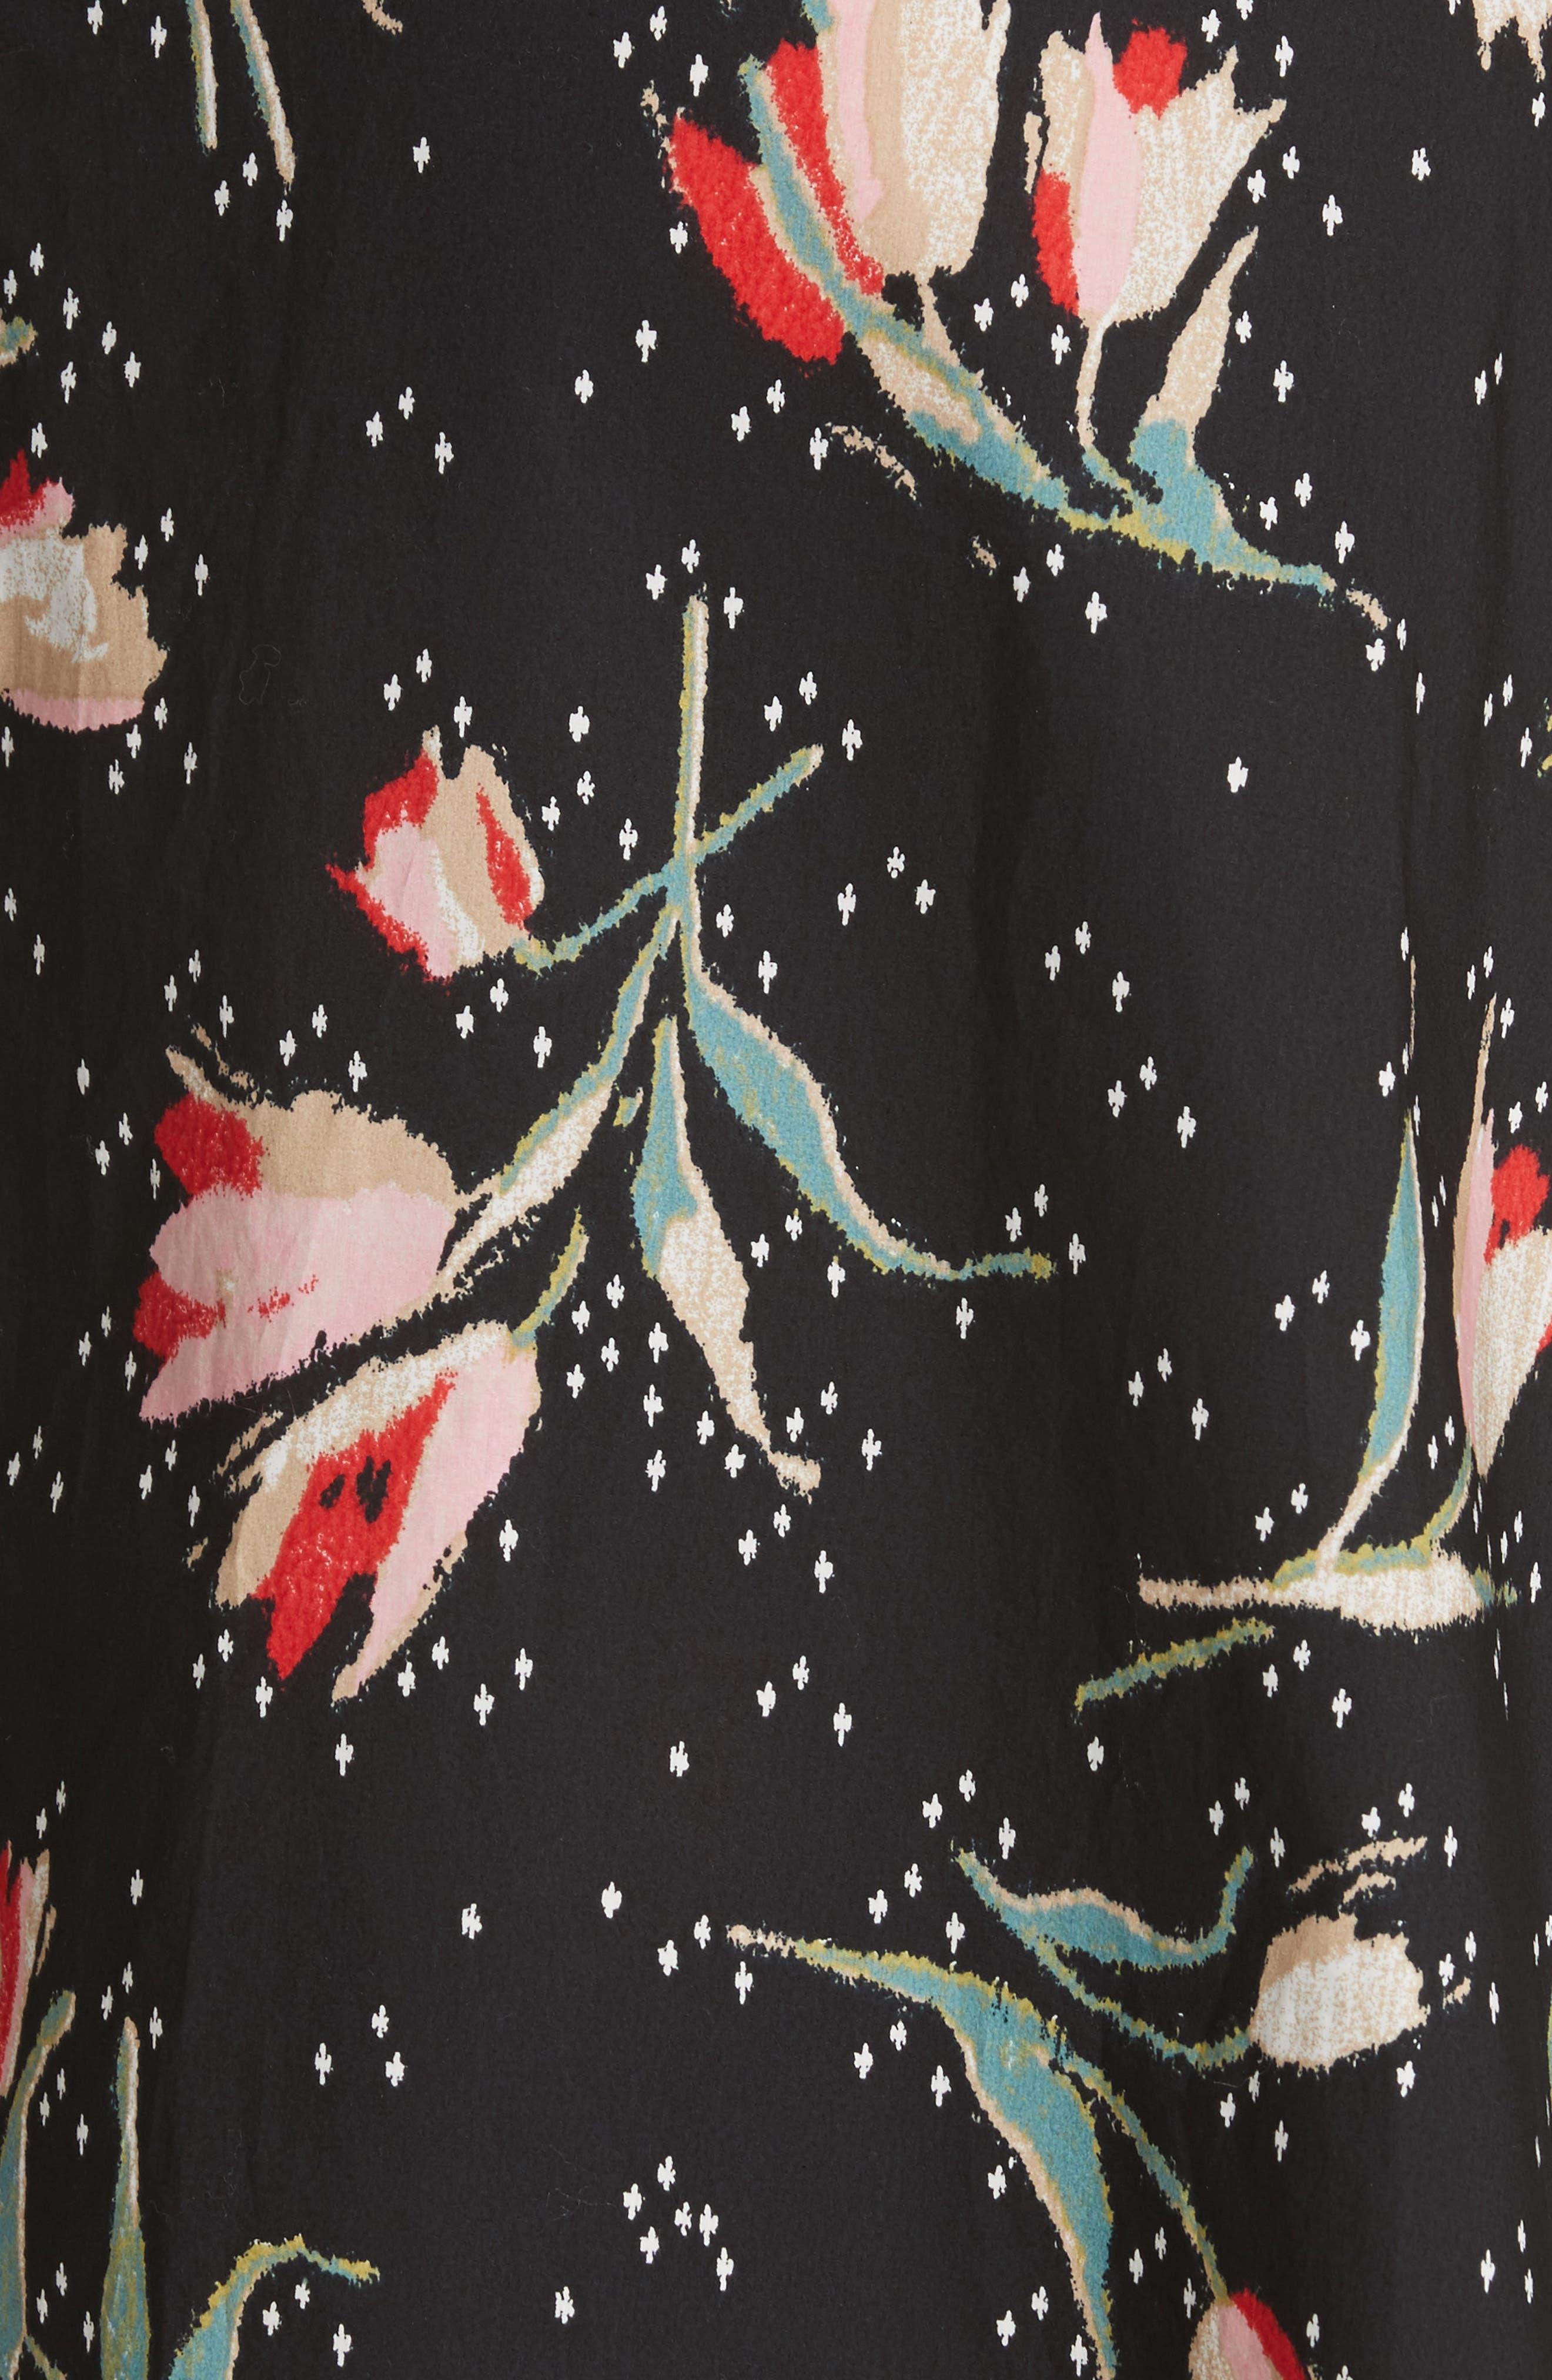 Floral Ikat Wrap Skirt,                             Alternate thumbnail 5, color,                             Black Combo